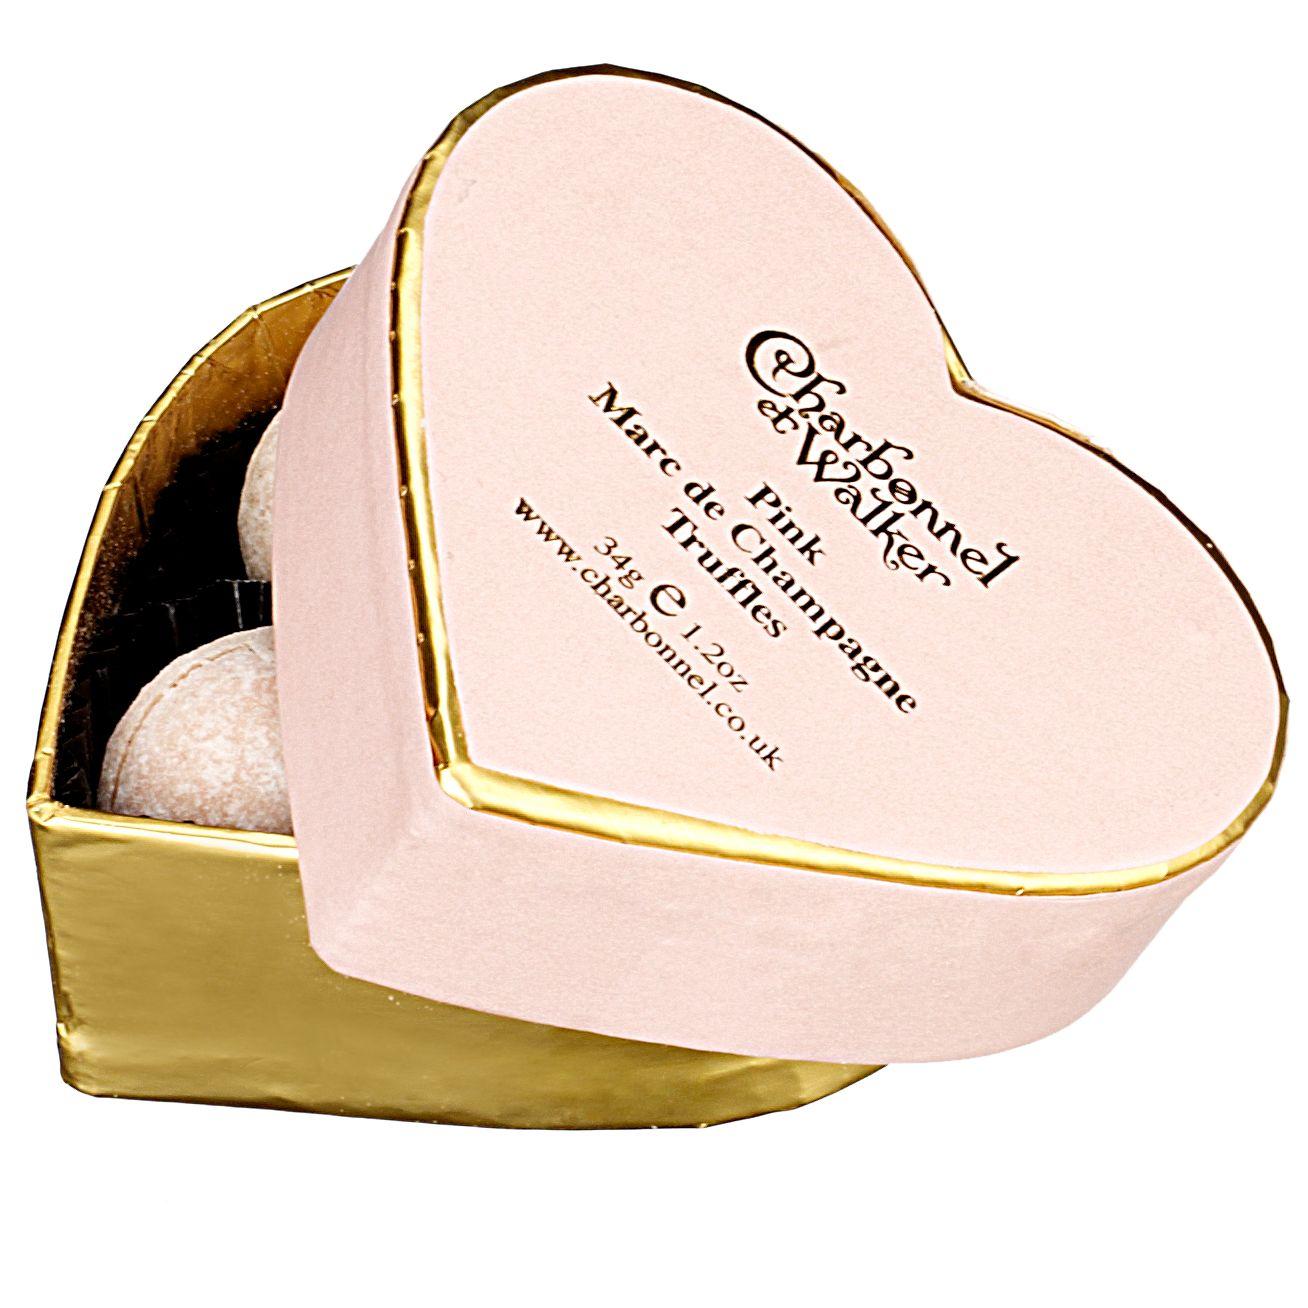 Charbonnel et Walker Charbonnel et Walker Mini Pink Heart Champagne Truffles, 34g